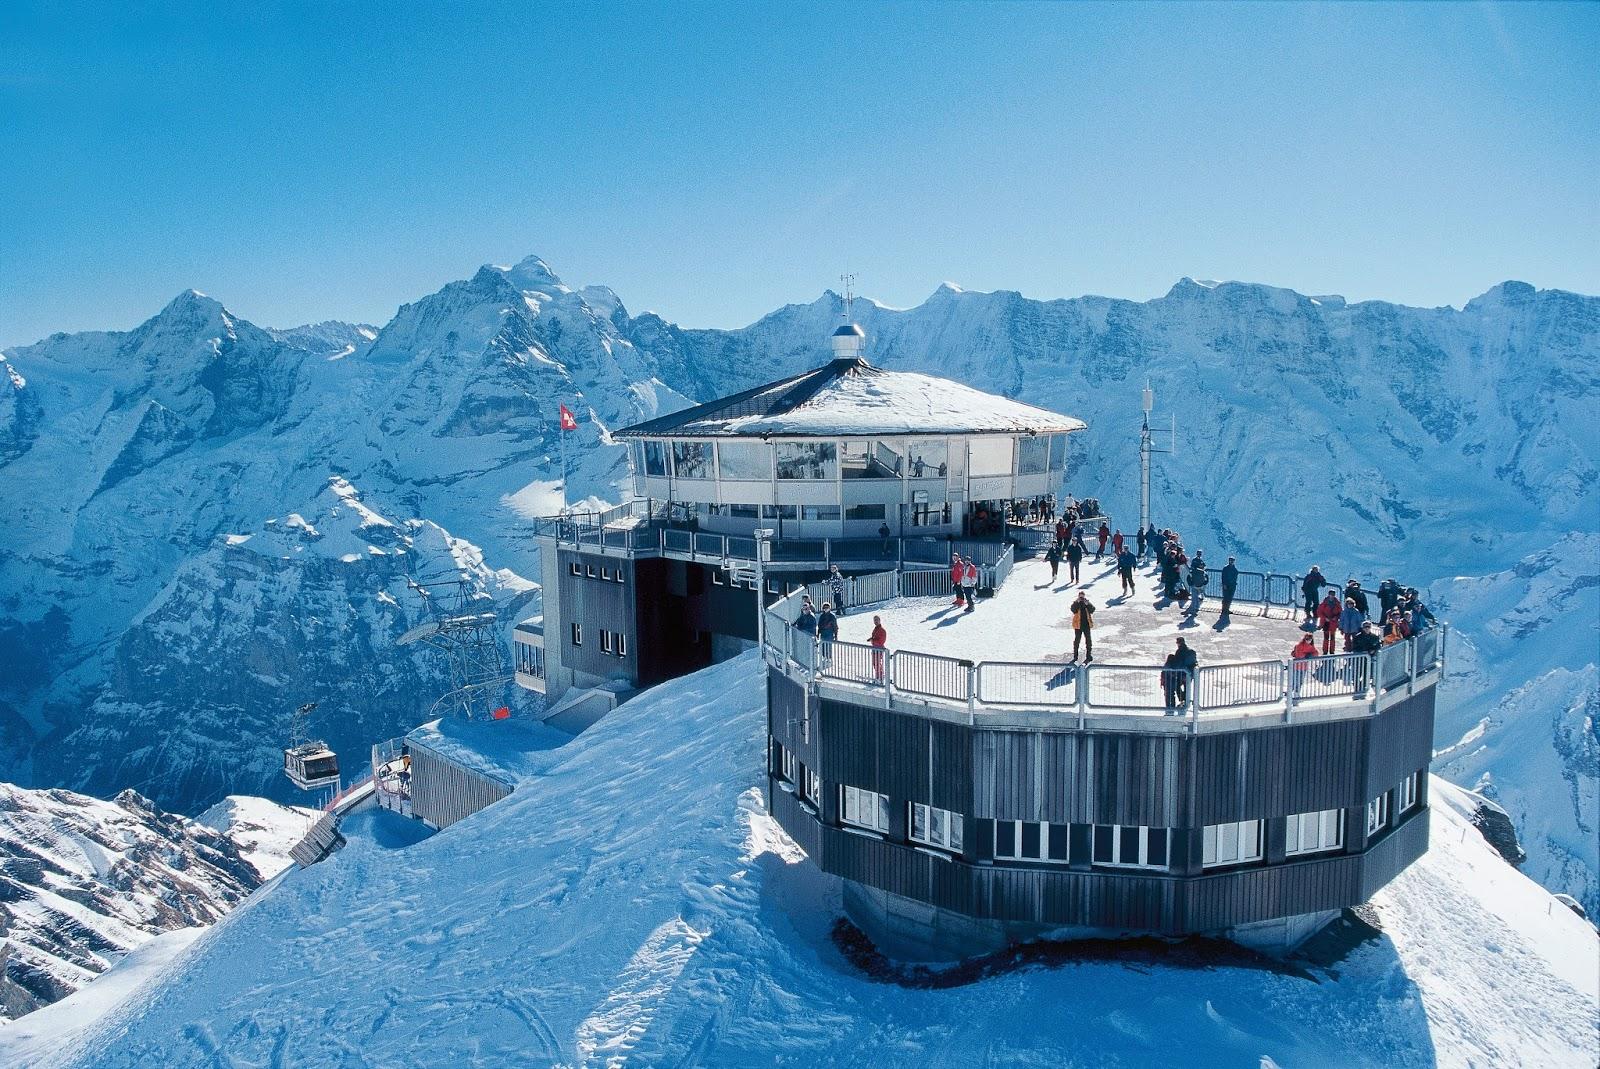 Plan Your Honeymoon in Switzerland | Jungfrau Region